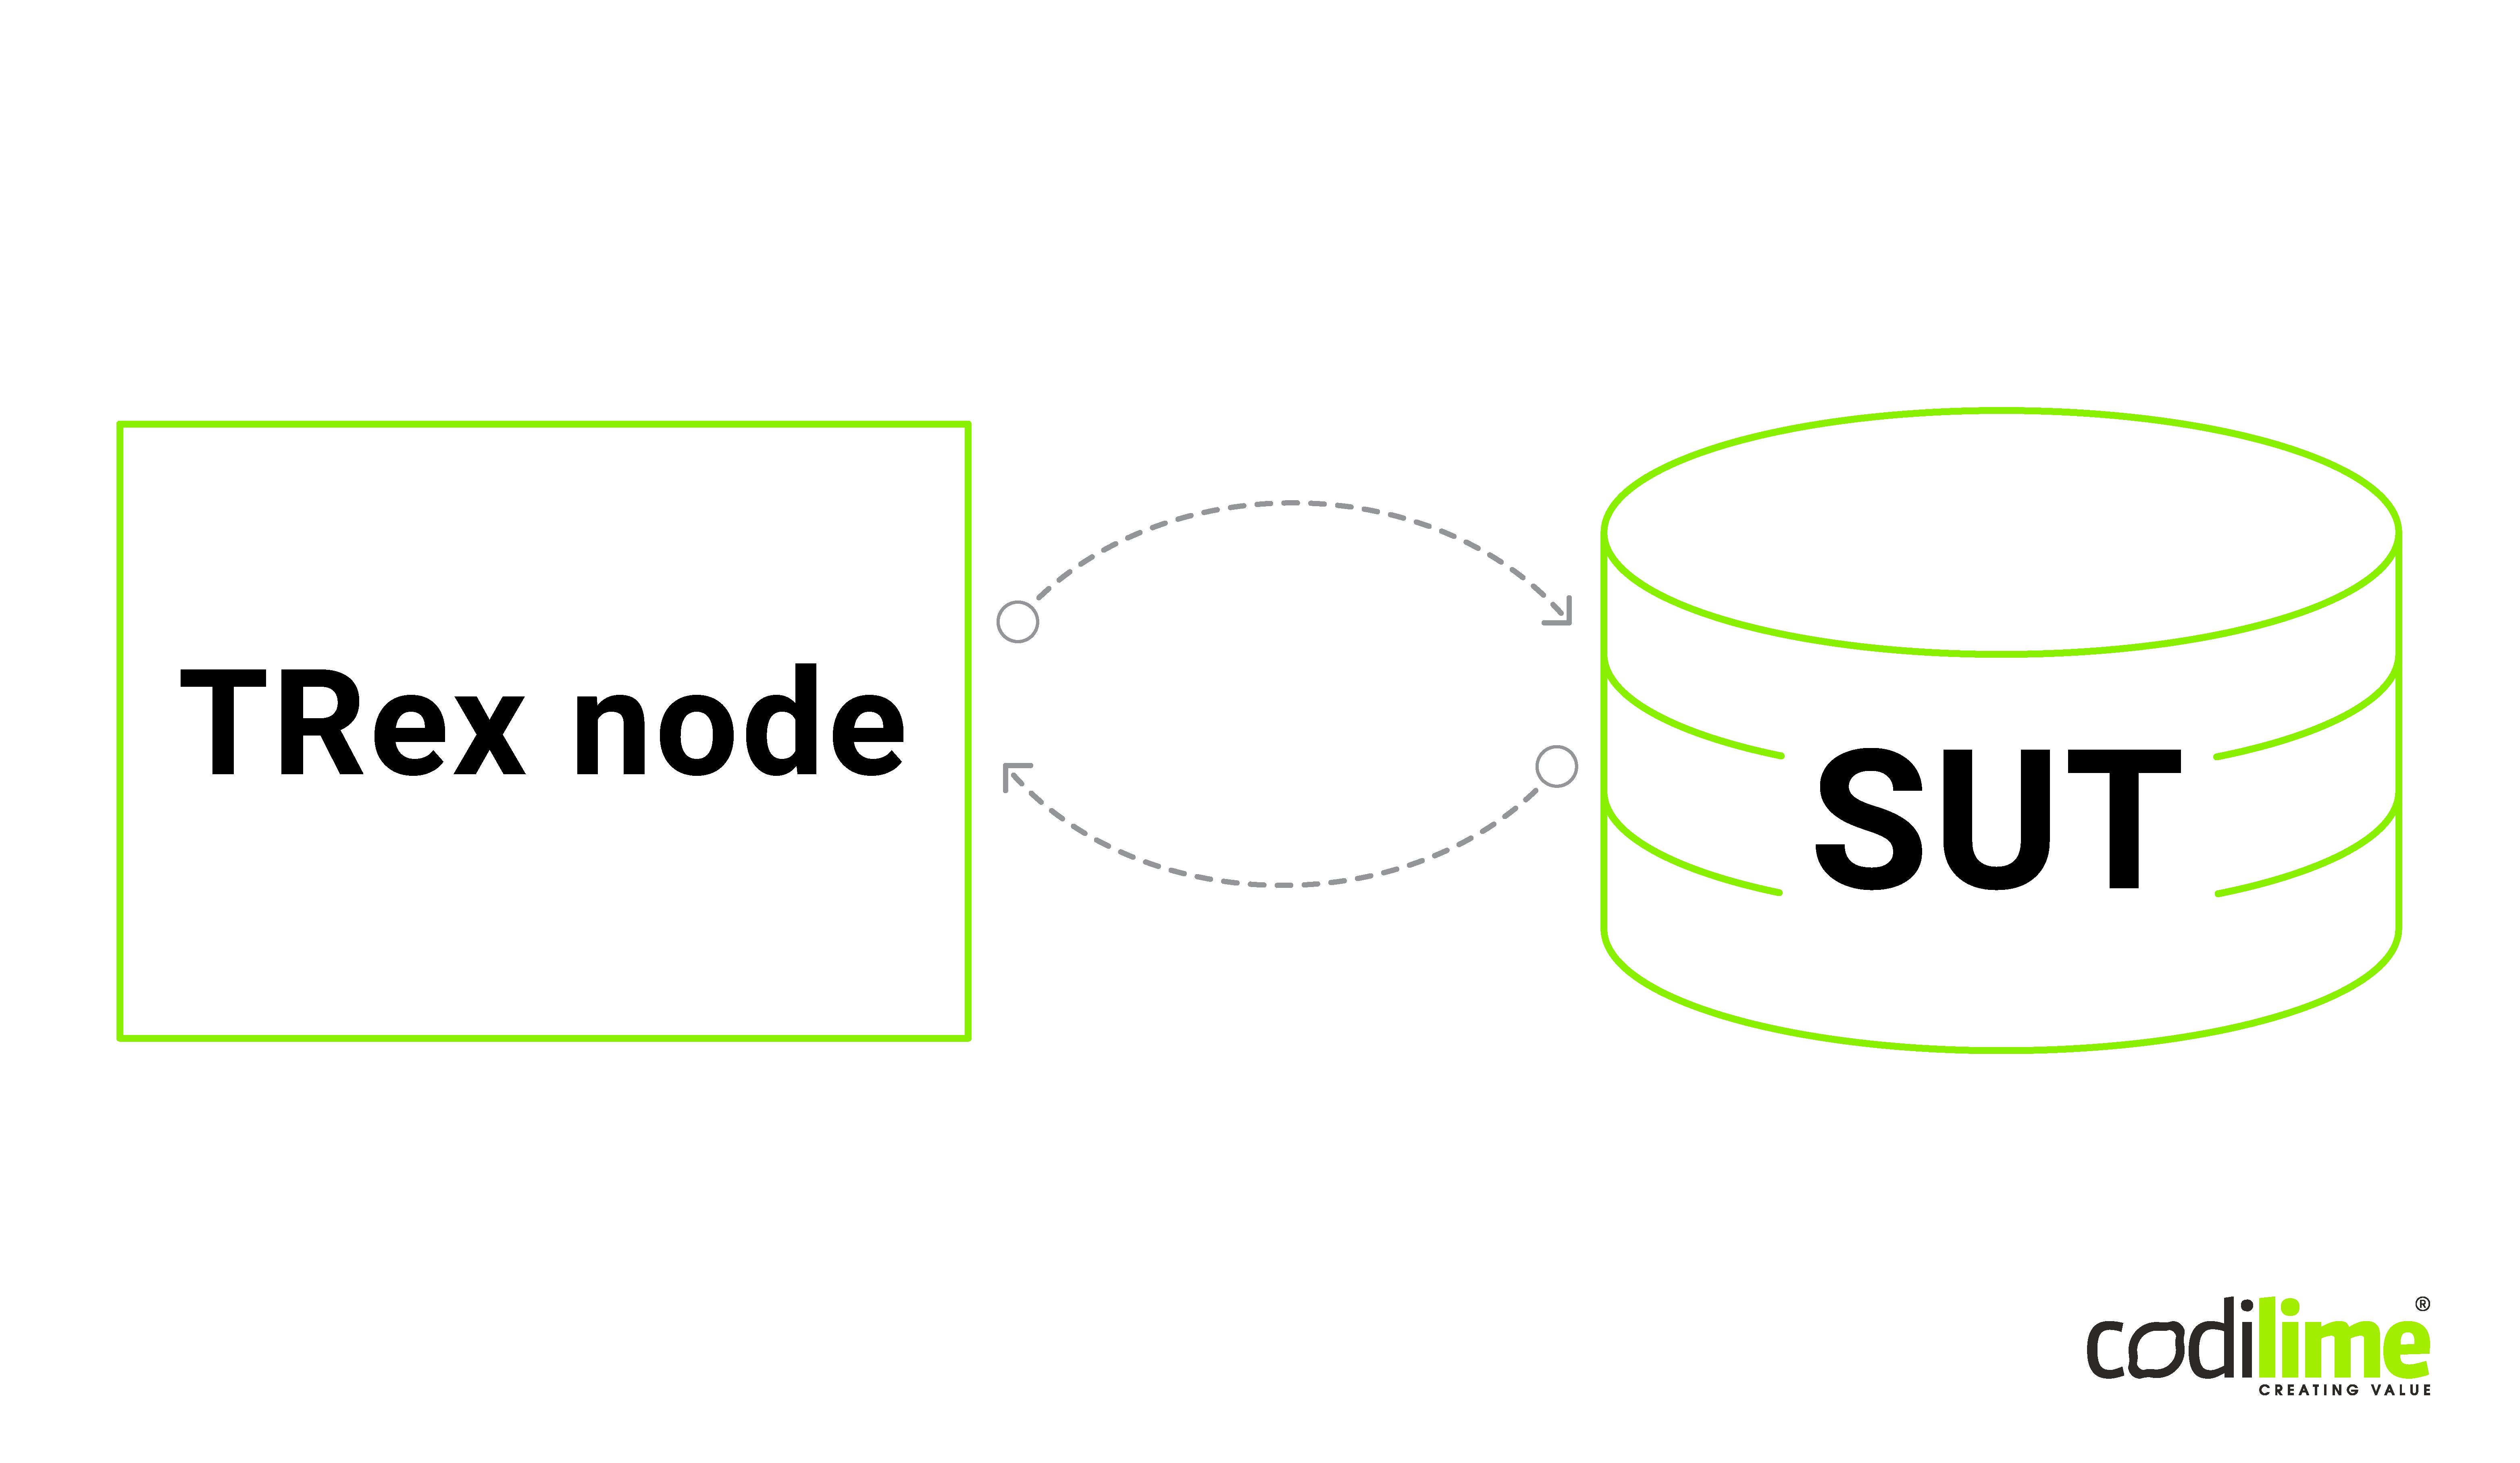 Traditional network testing setup